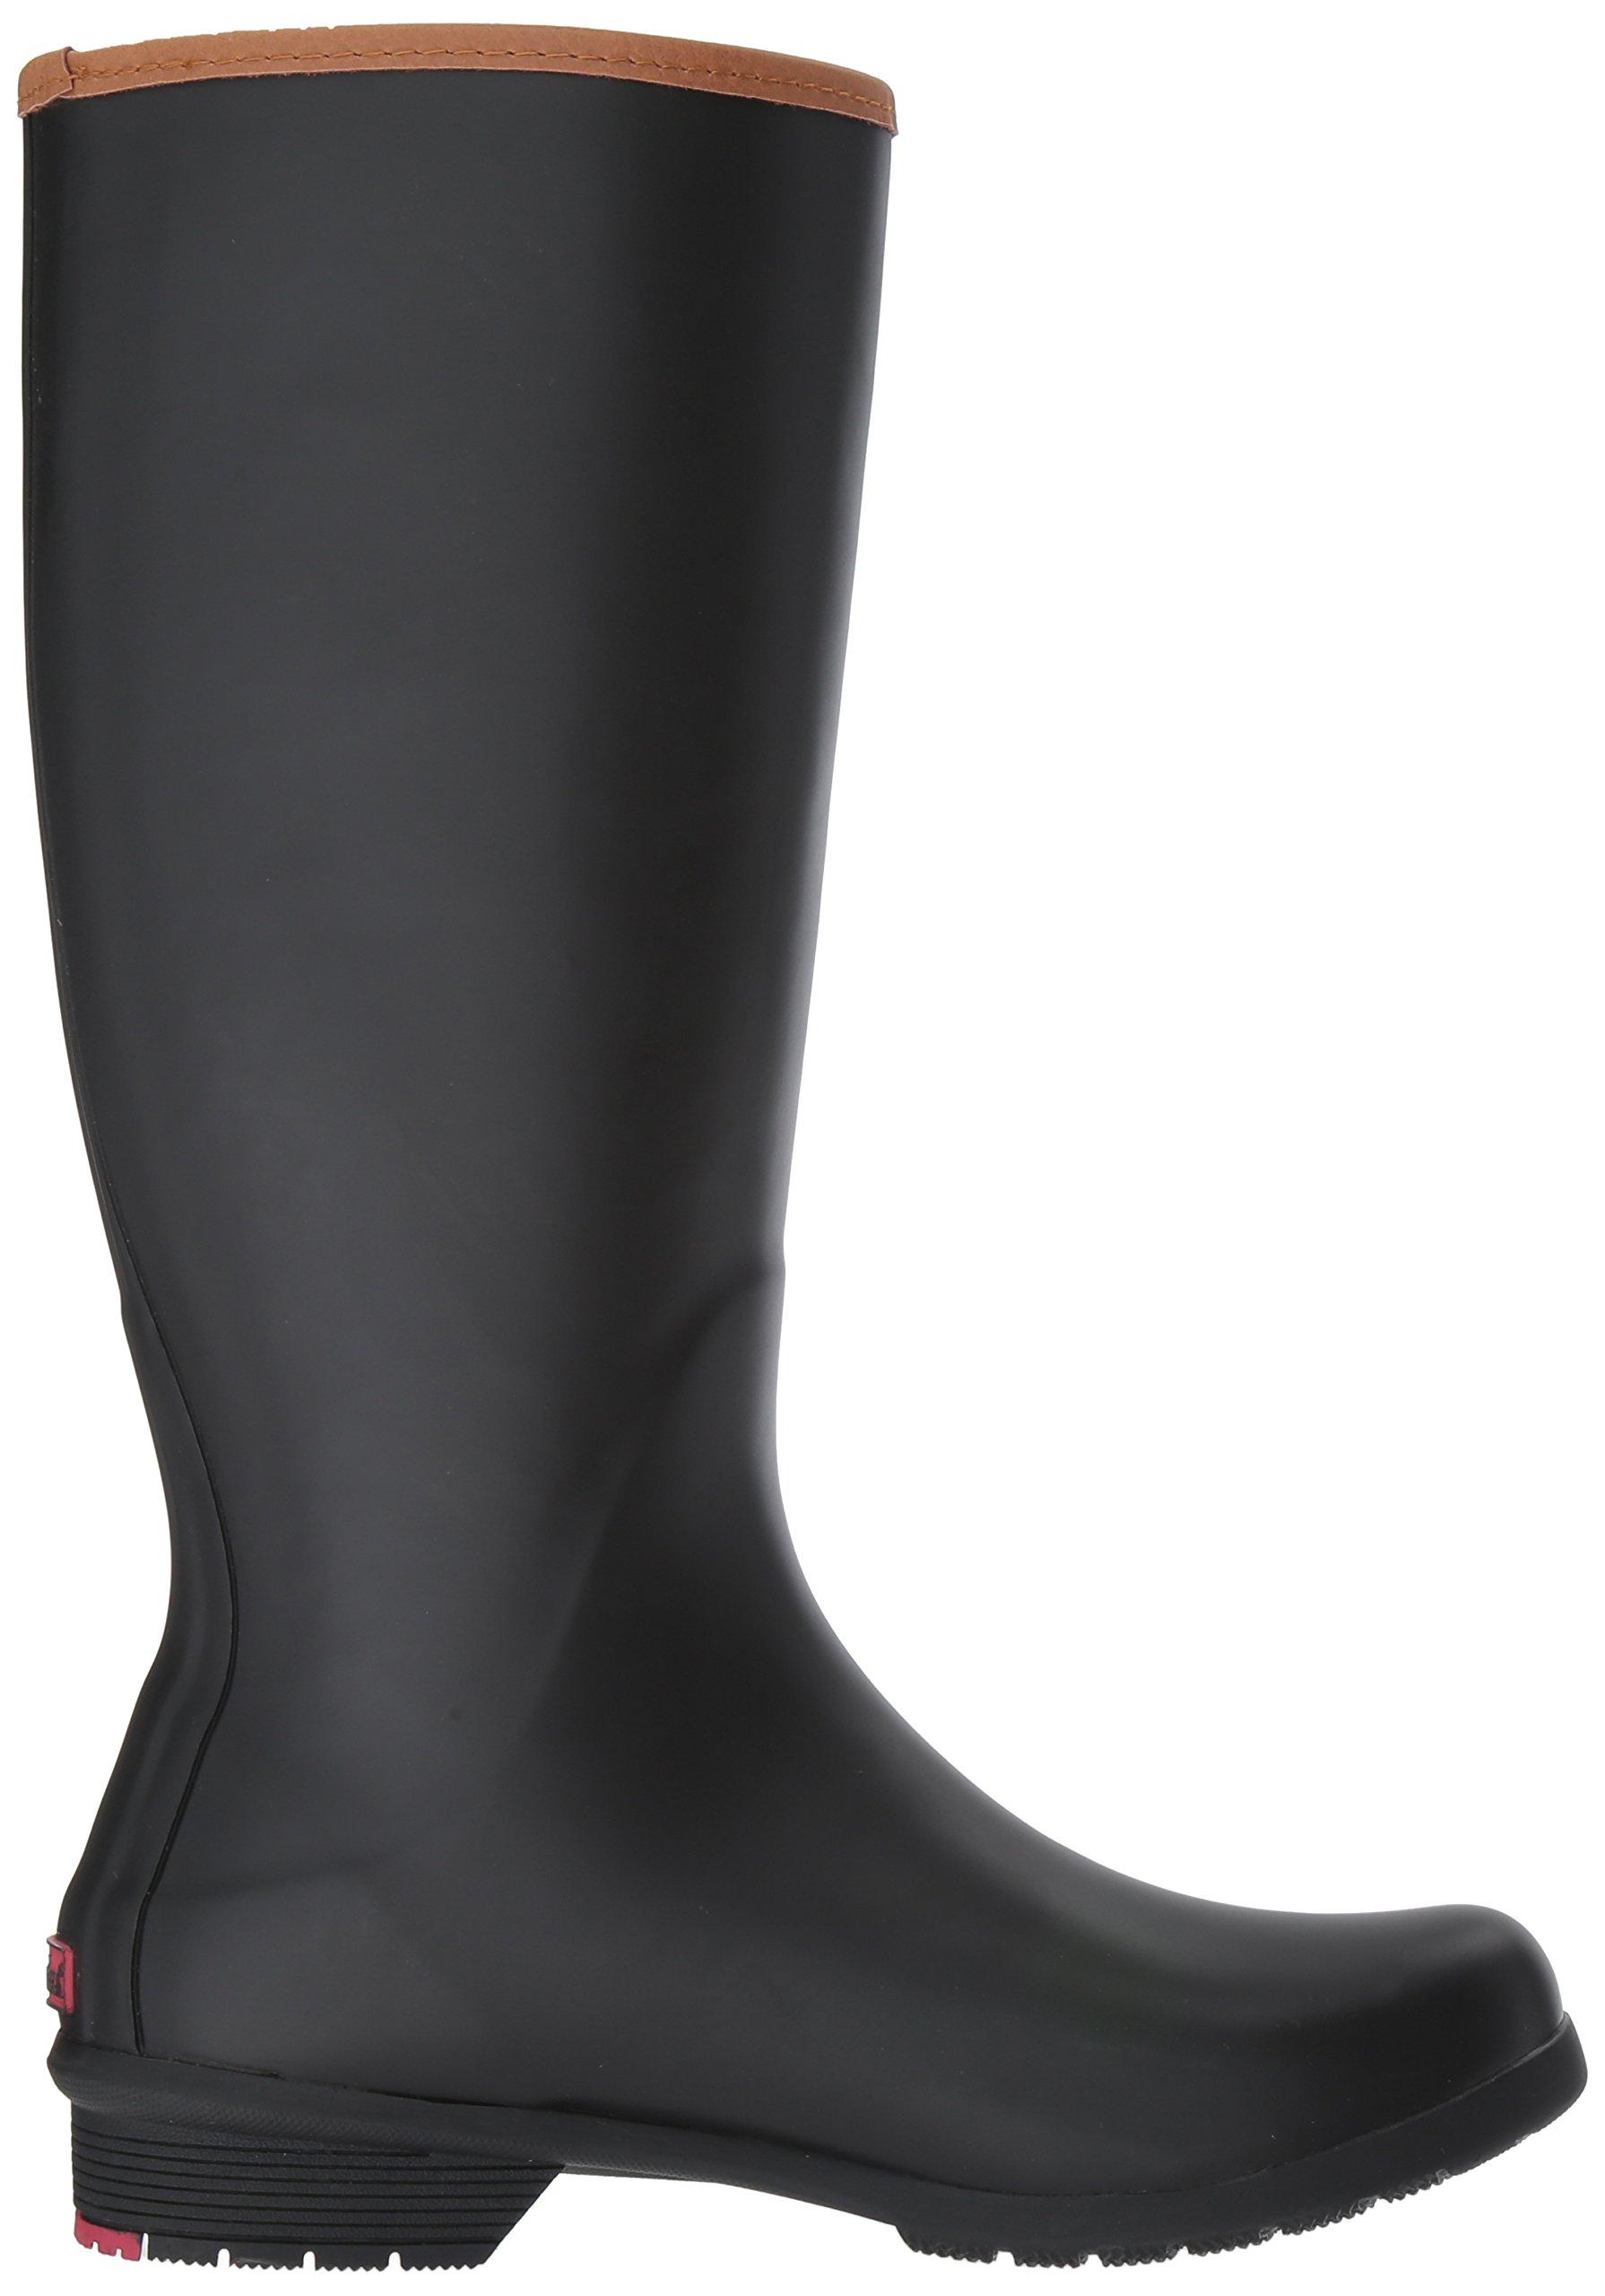 Chooka Women's Tall Memory Foam Rain Boot, Black, 7 M US by Chooka (Image #9)